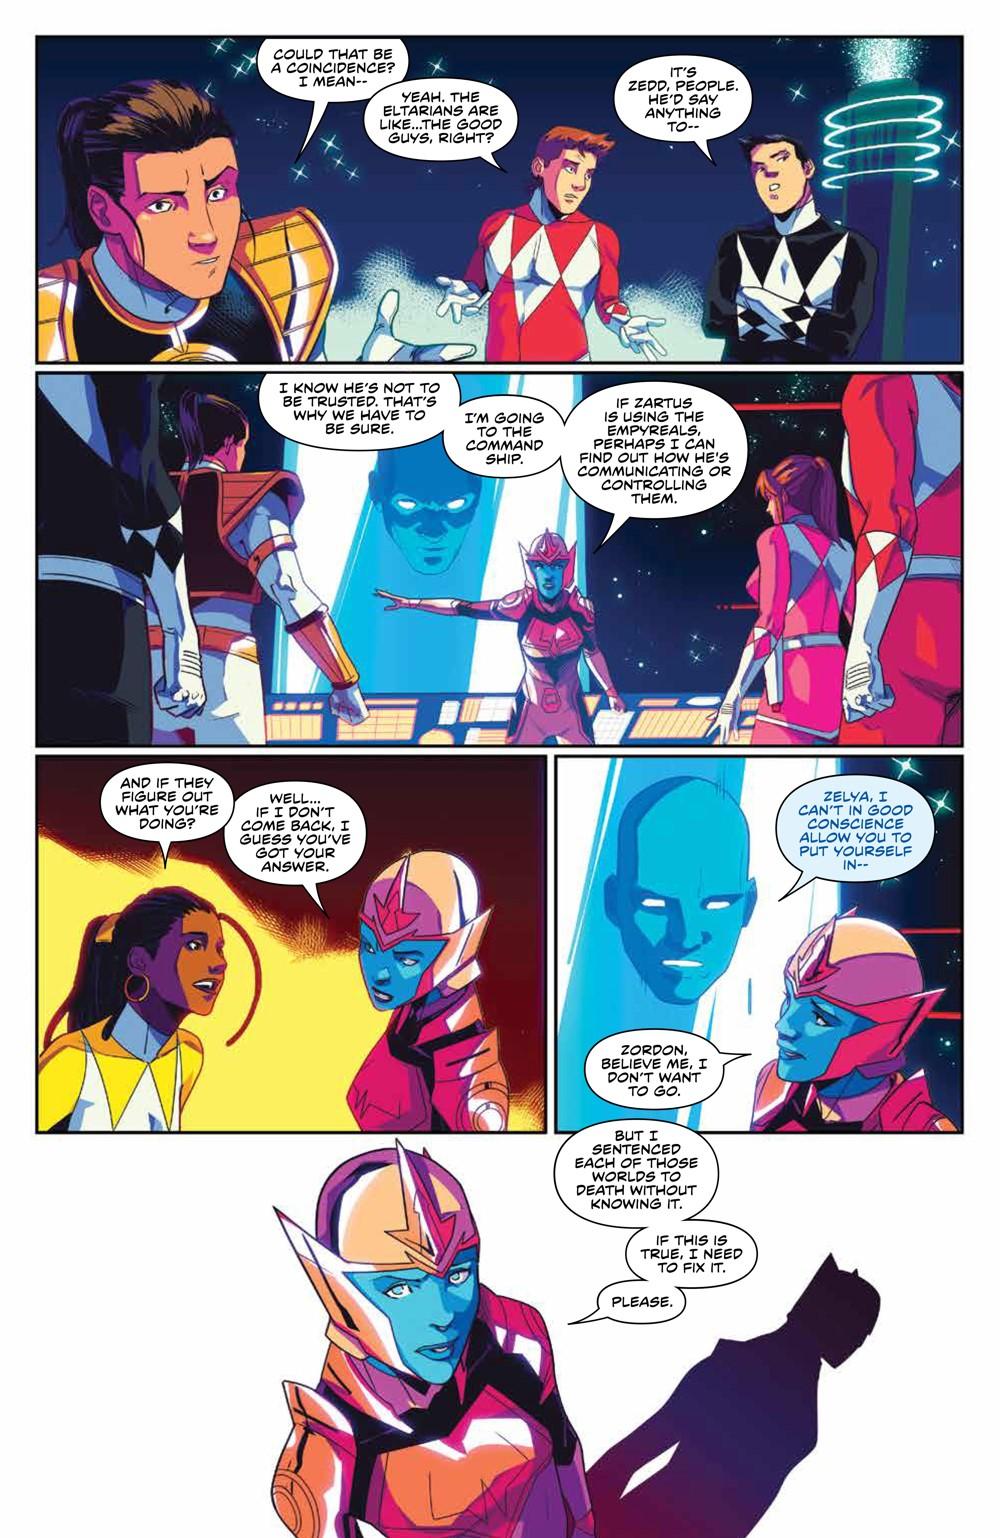 MightyMorphin_012_PRESS_8 ComicList Previews: MIGHTY MORPHIN #12